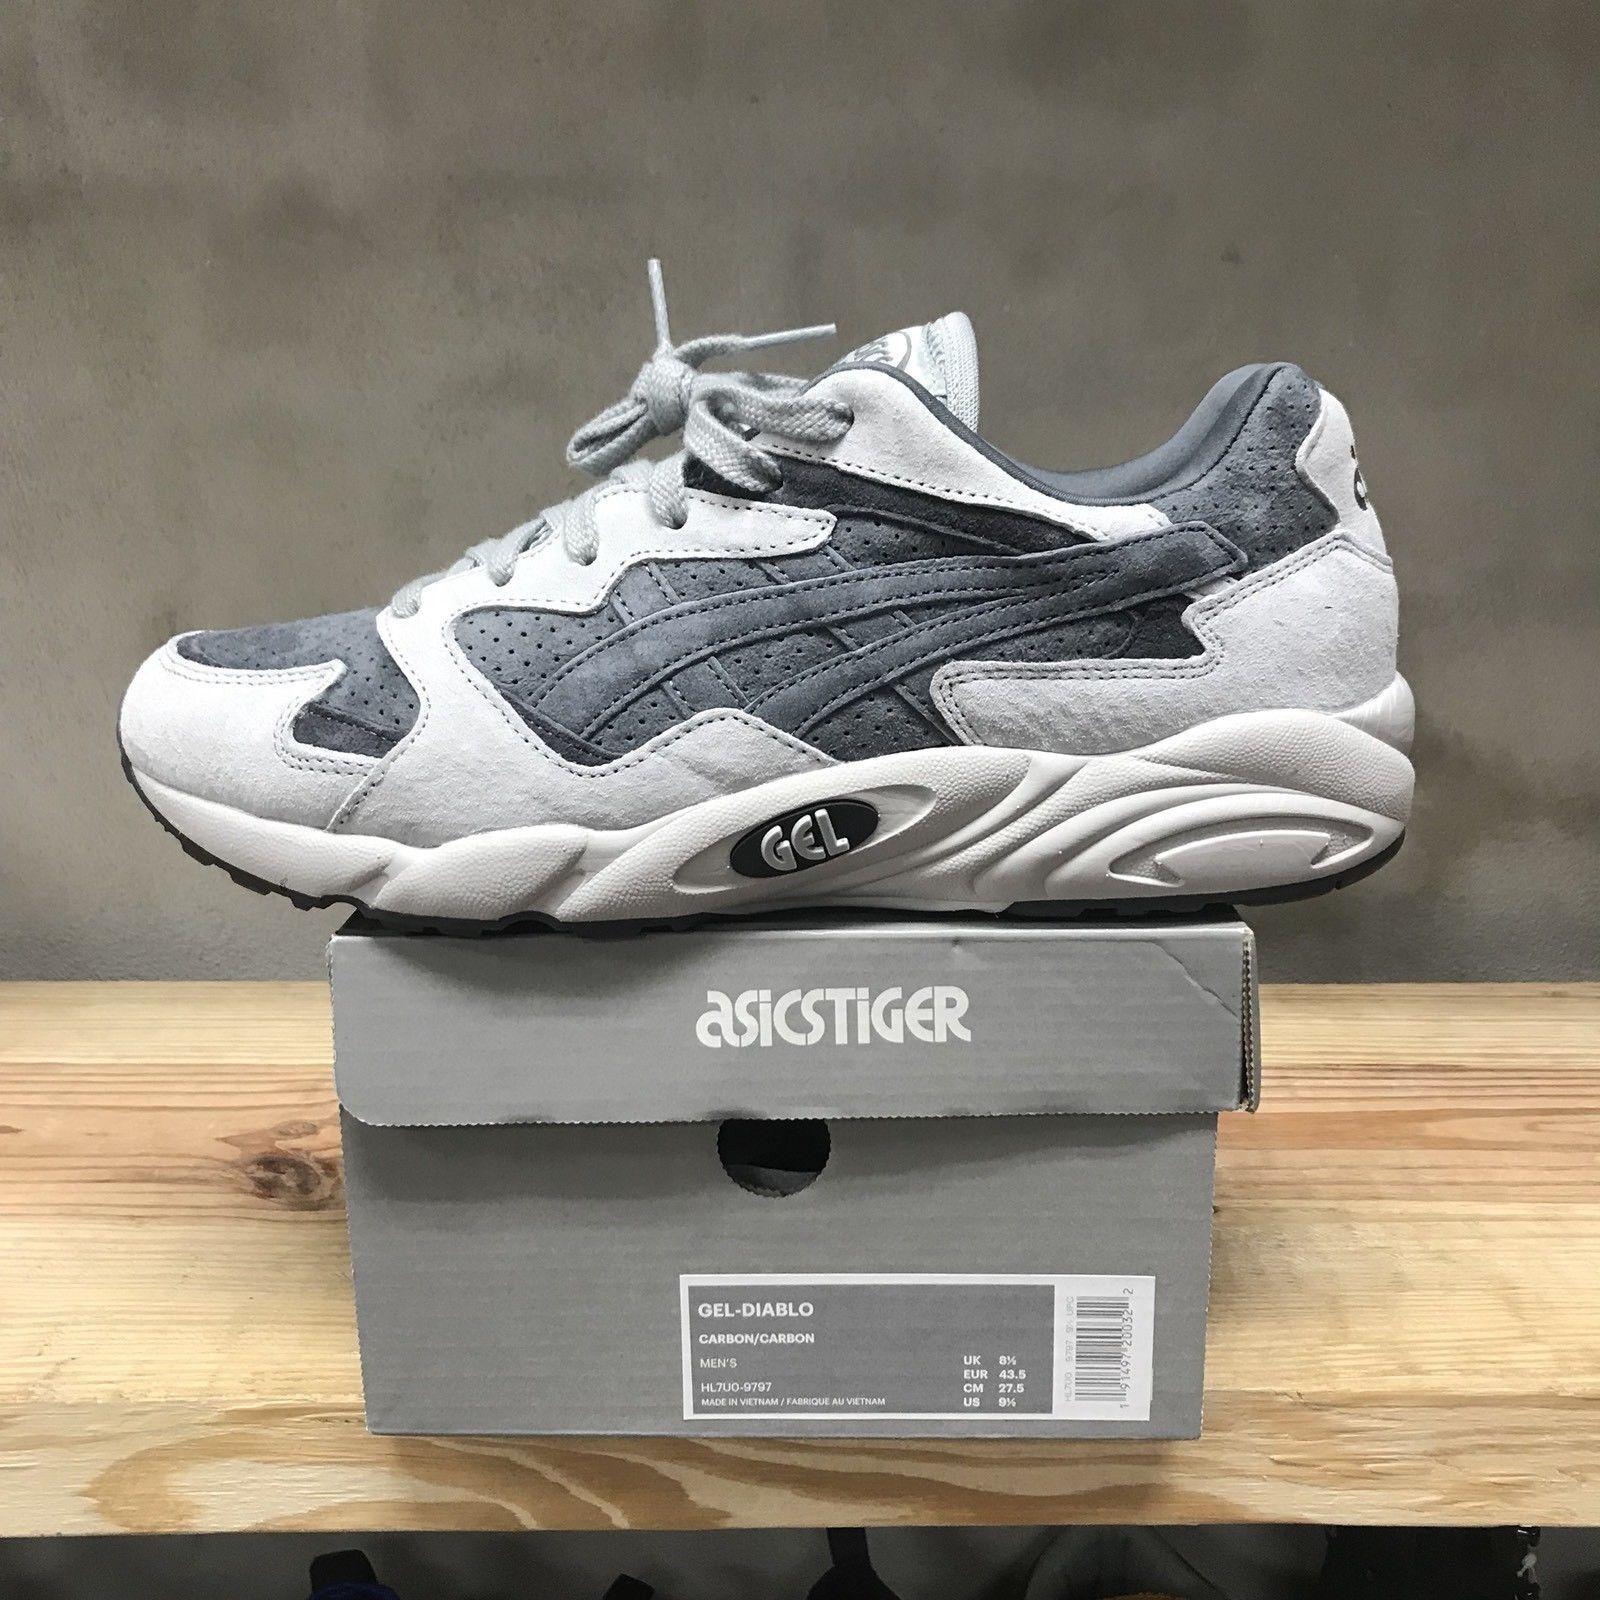 ASICS GEL-DIABLO - Grey Size 9.5